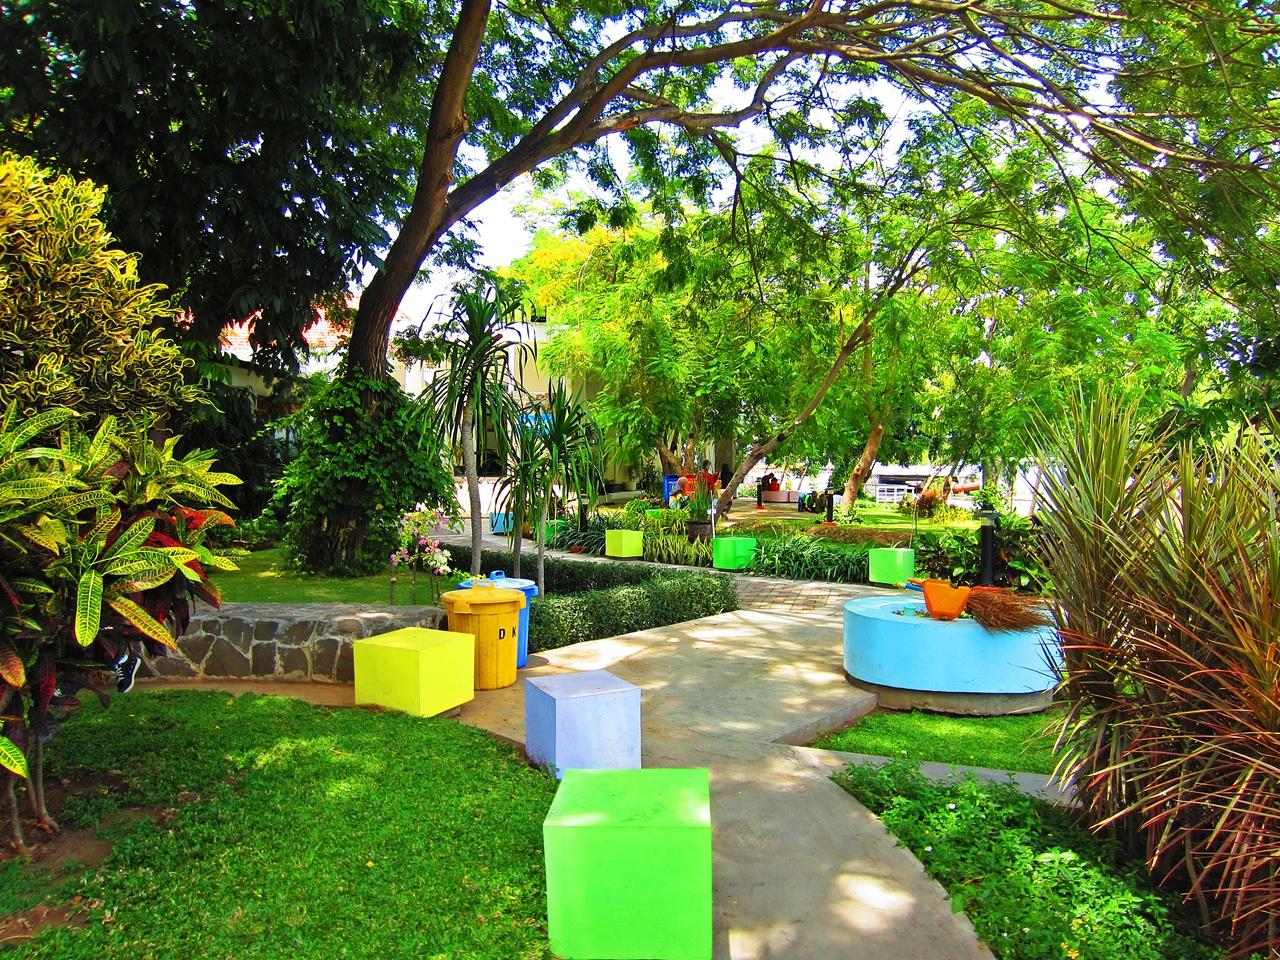 Keindahan Wisata Alam Taman Buah Undaan Surabaya Kota